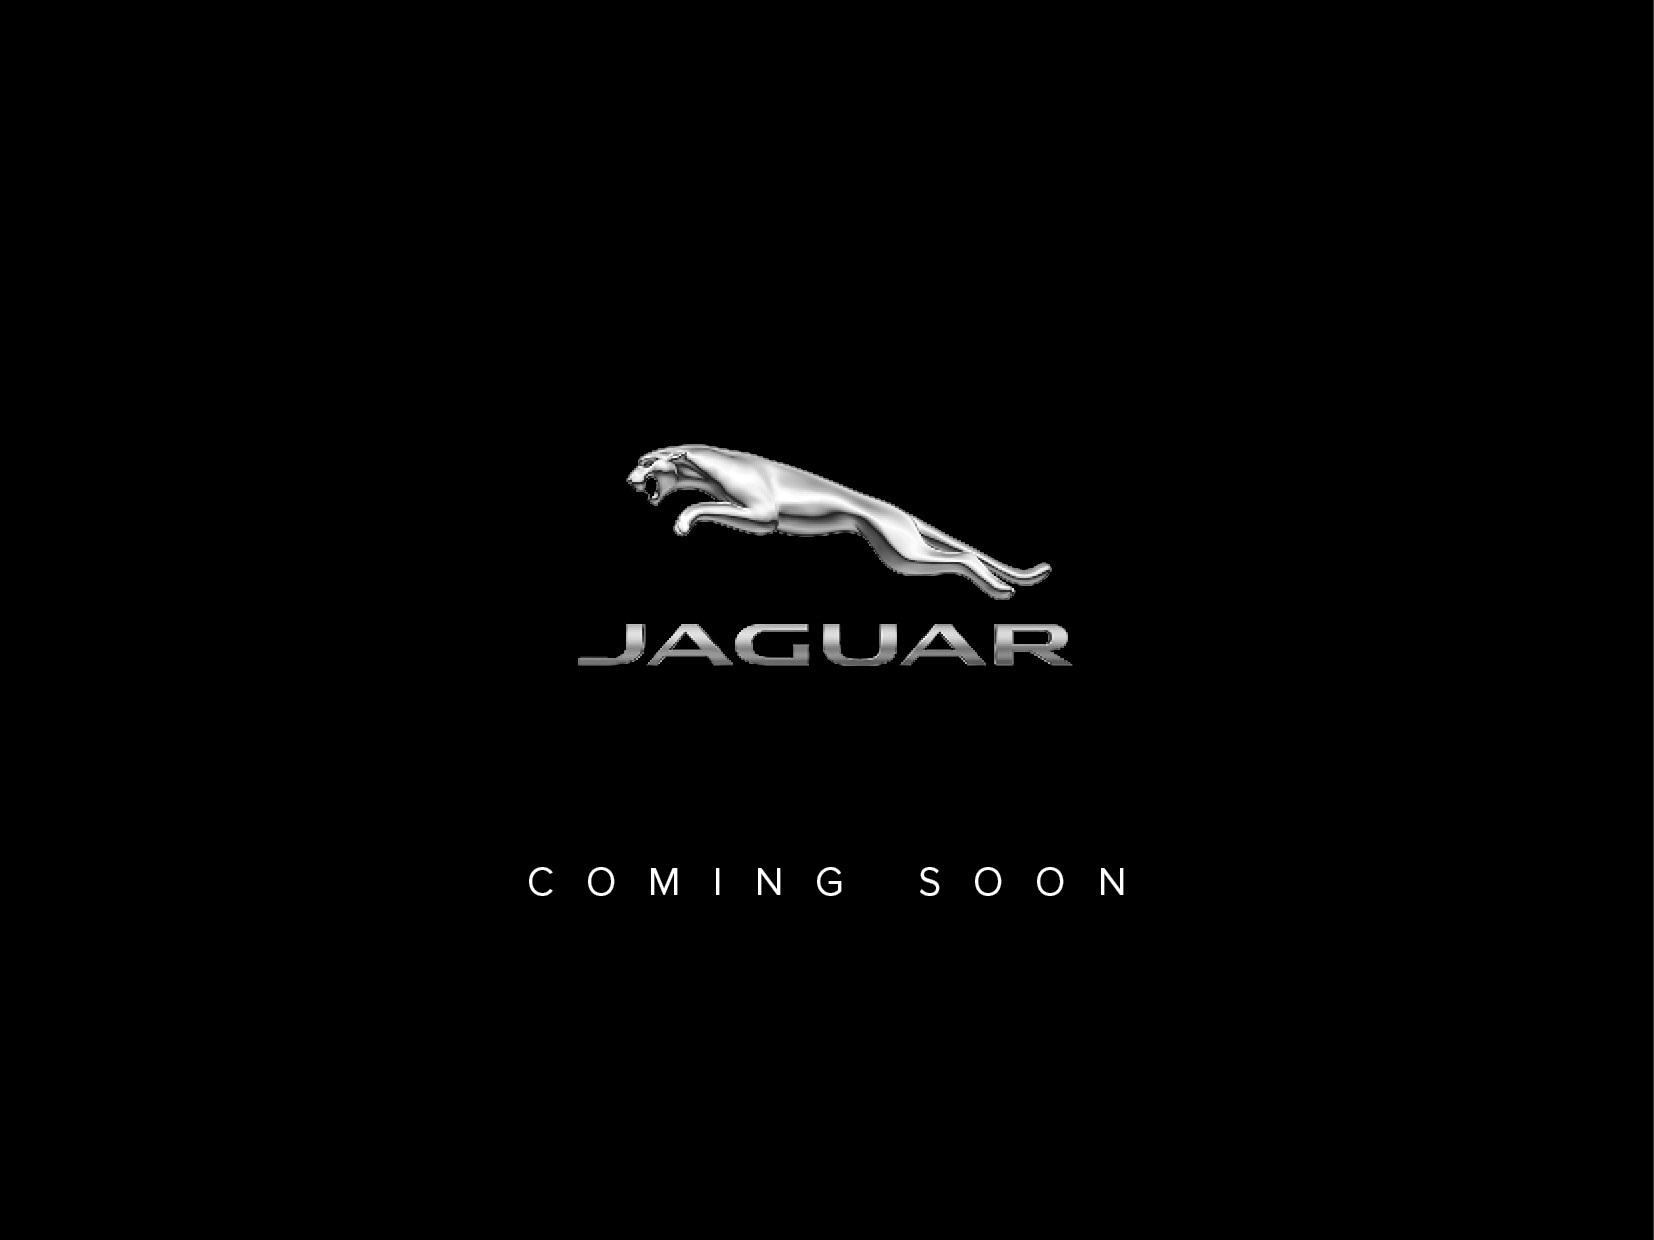 Jaguar XE 2.0d [180] R-Sport Low Miles Diesel Automatic 4 door Saloon (2018)